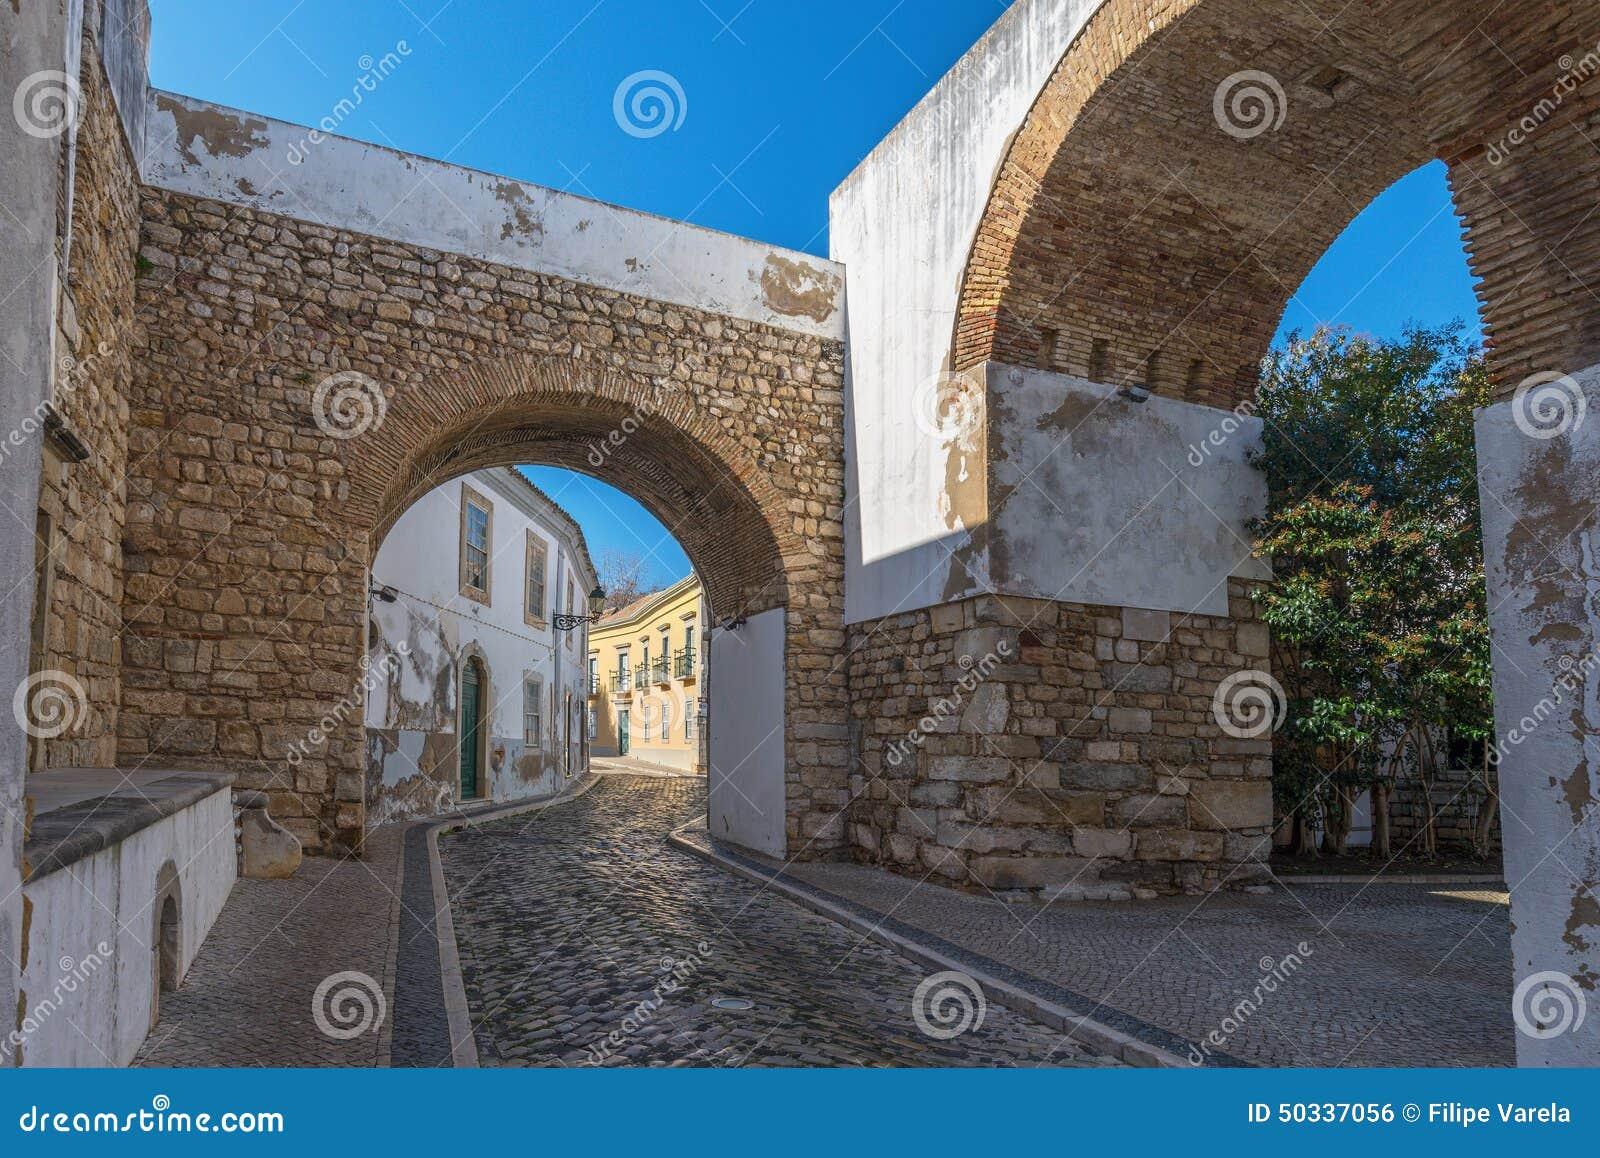 Europa Portugal, Algarve, stad av FARO - traditionell gata